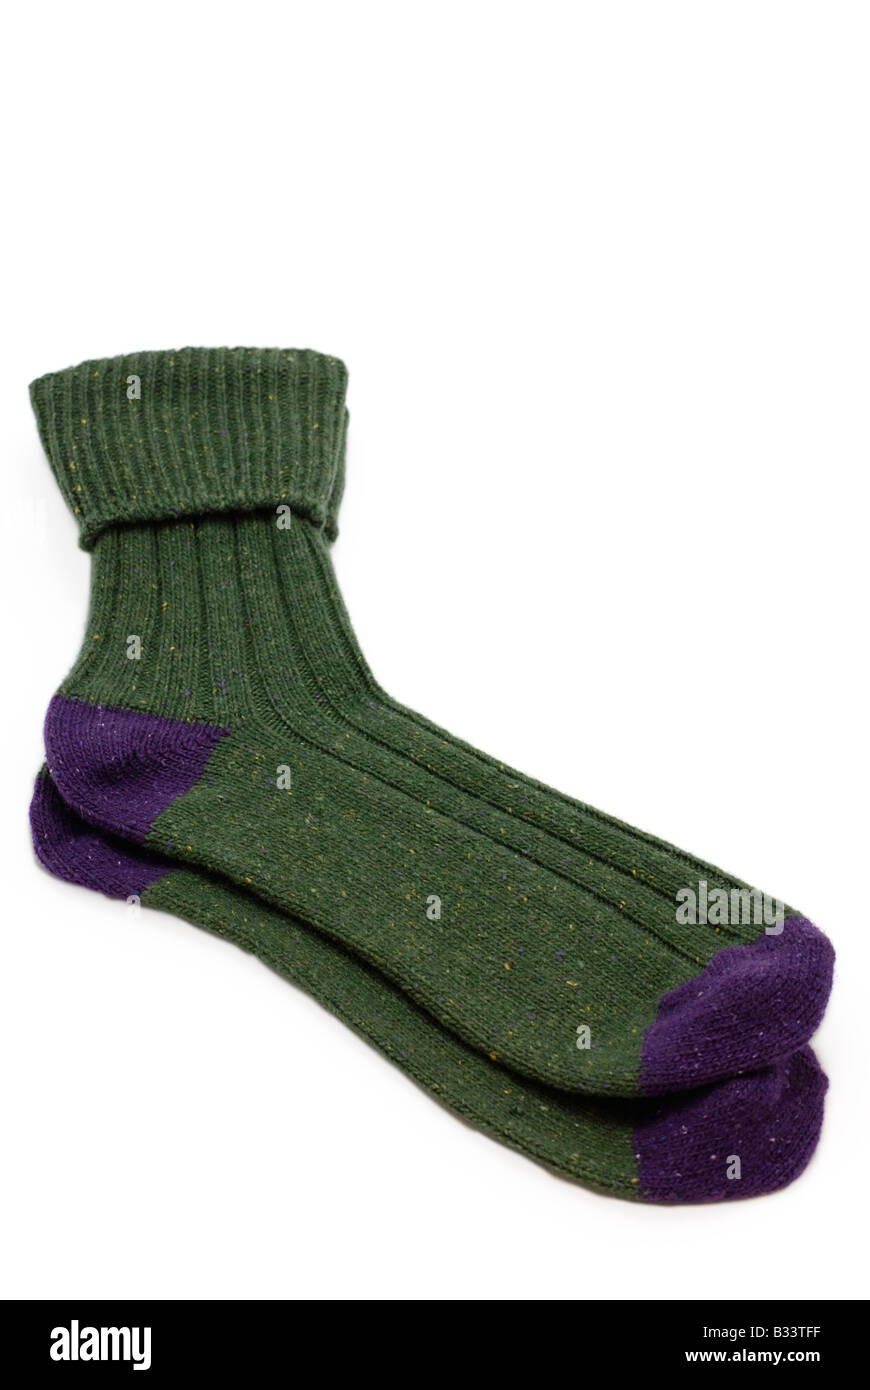 Pair of Woolen Winter Socks - Stock Image